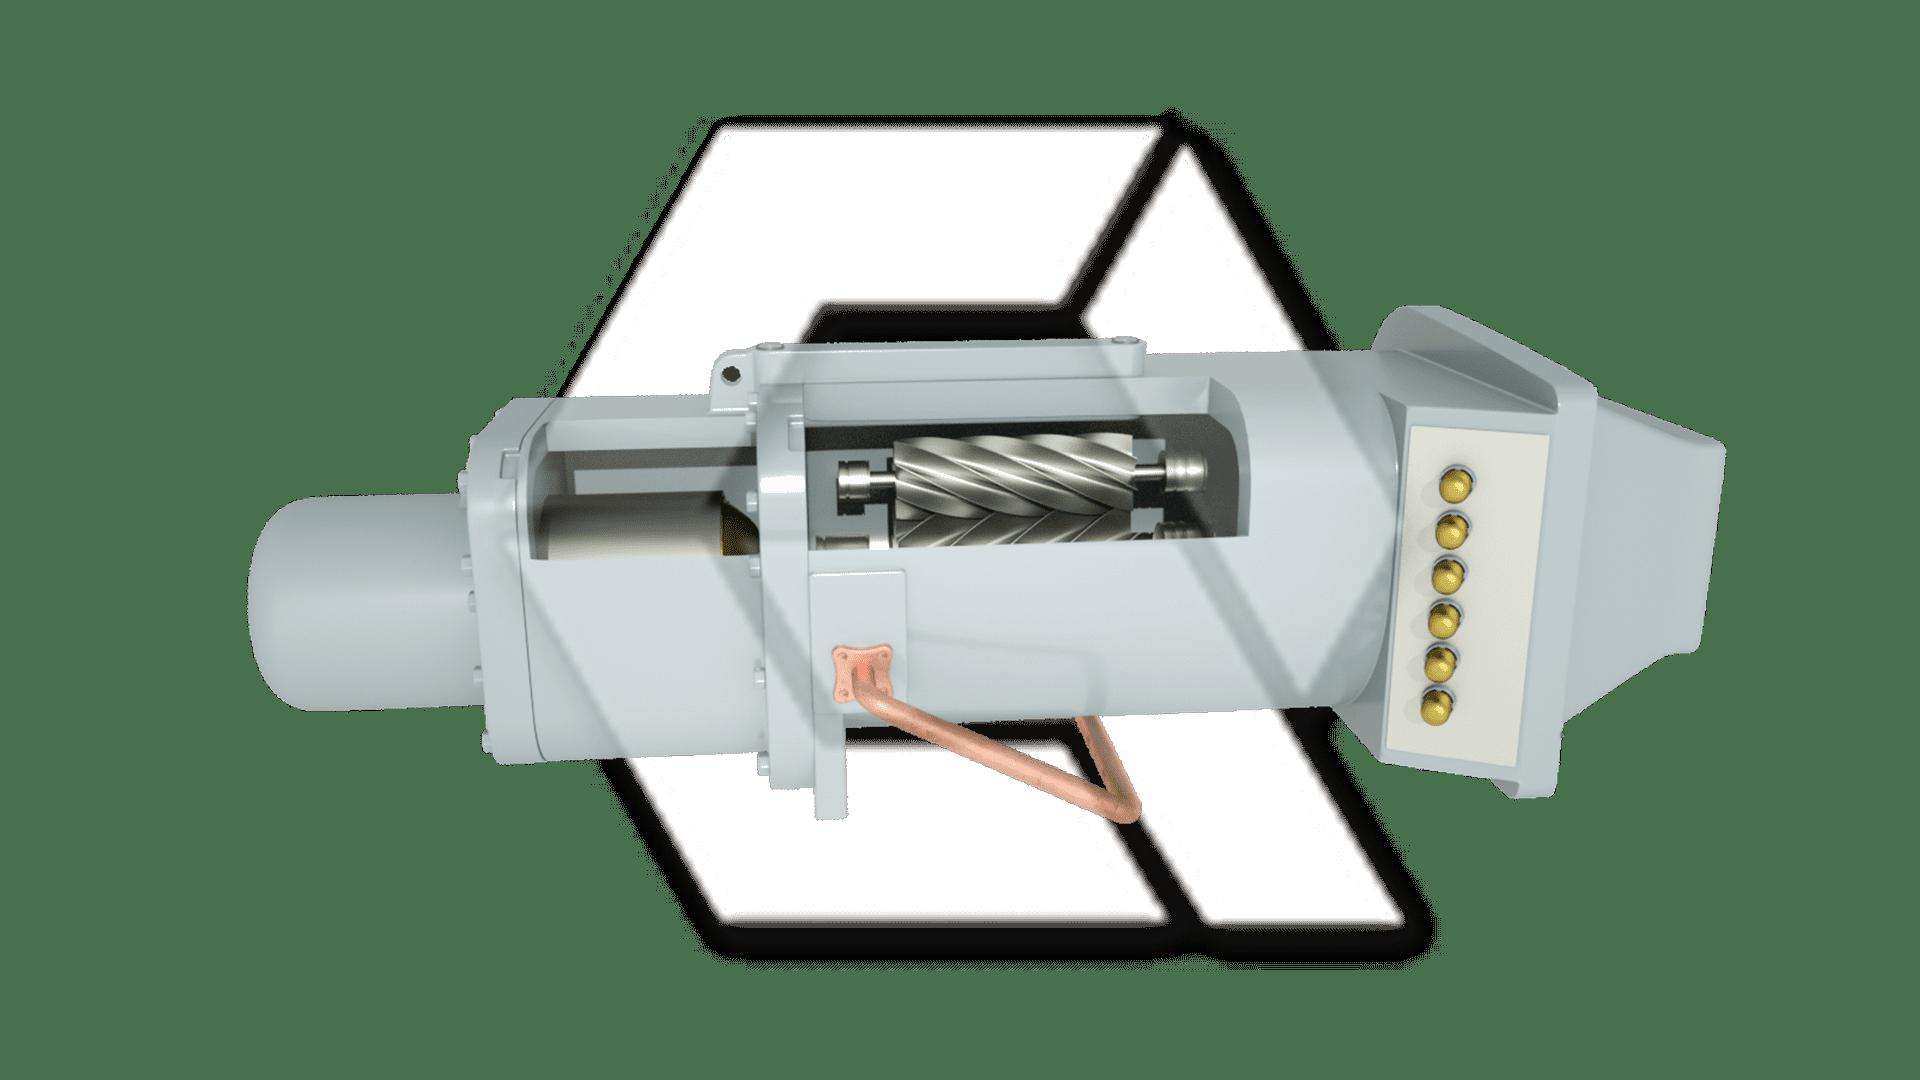 Carrier Air Chiller Screw Compressor